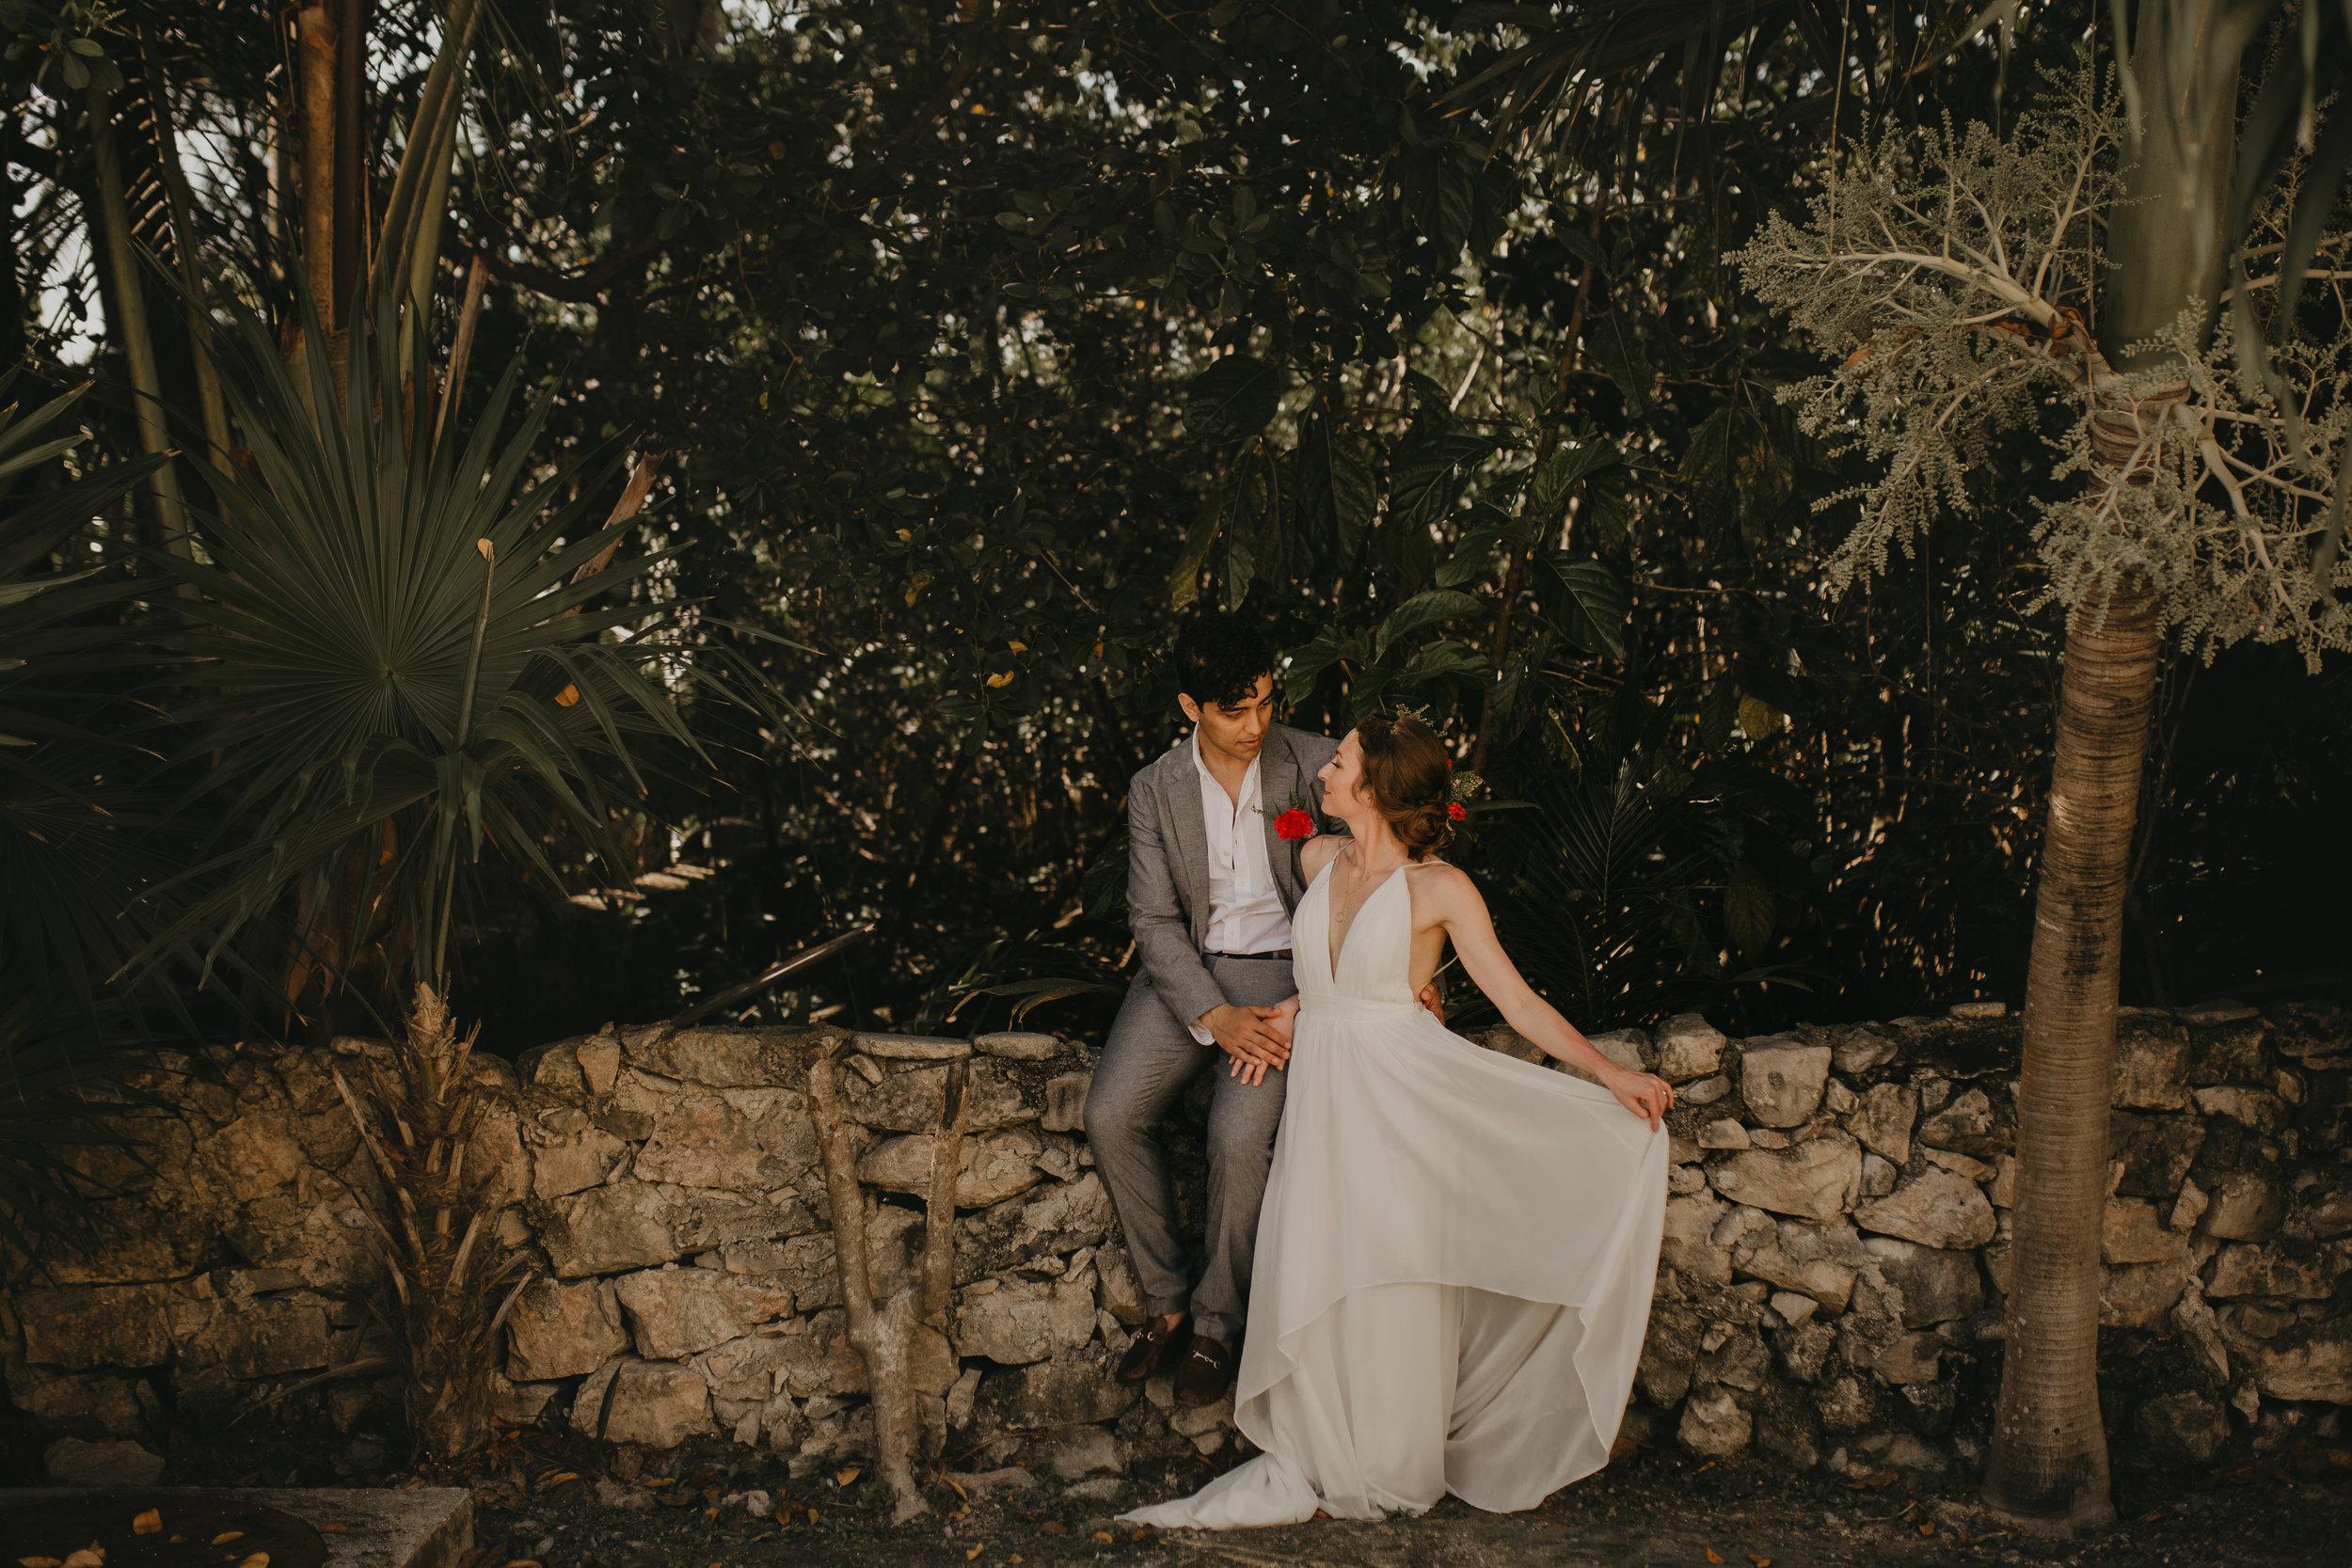 Nicole-Daacke-Photography-beachfront-akumal-destionation-wedding-tulum-mexico-elopement-photographer-destination-wedding-inspiration-sunset-champagne-pop-boho-bride-ocean-tropical-bohemian-tulum-wedding-photos-131.jpg